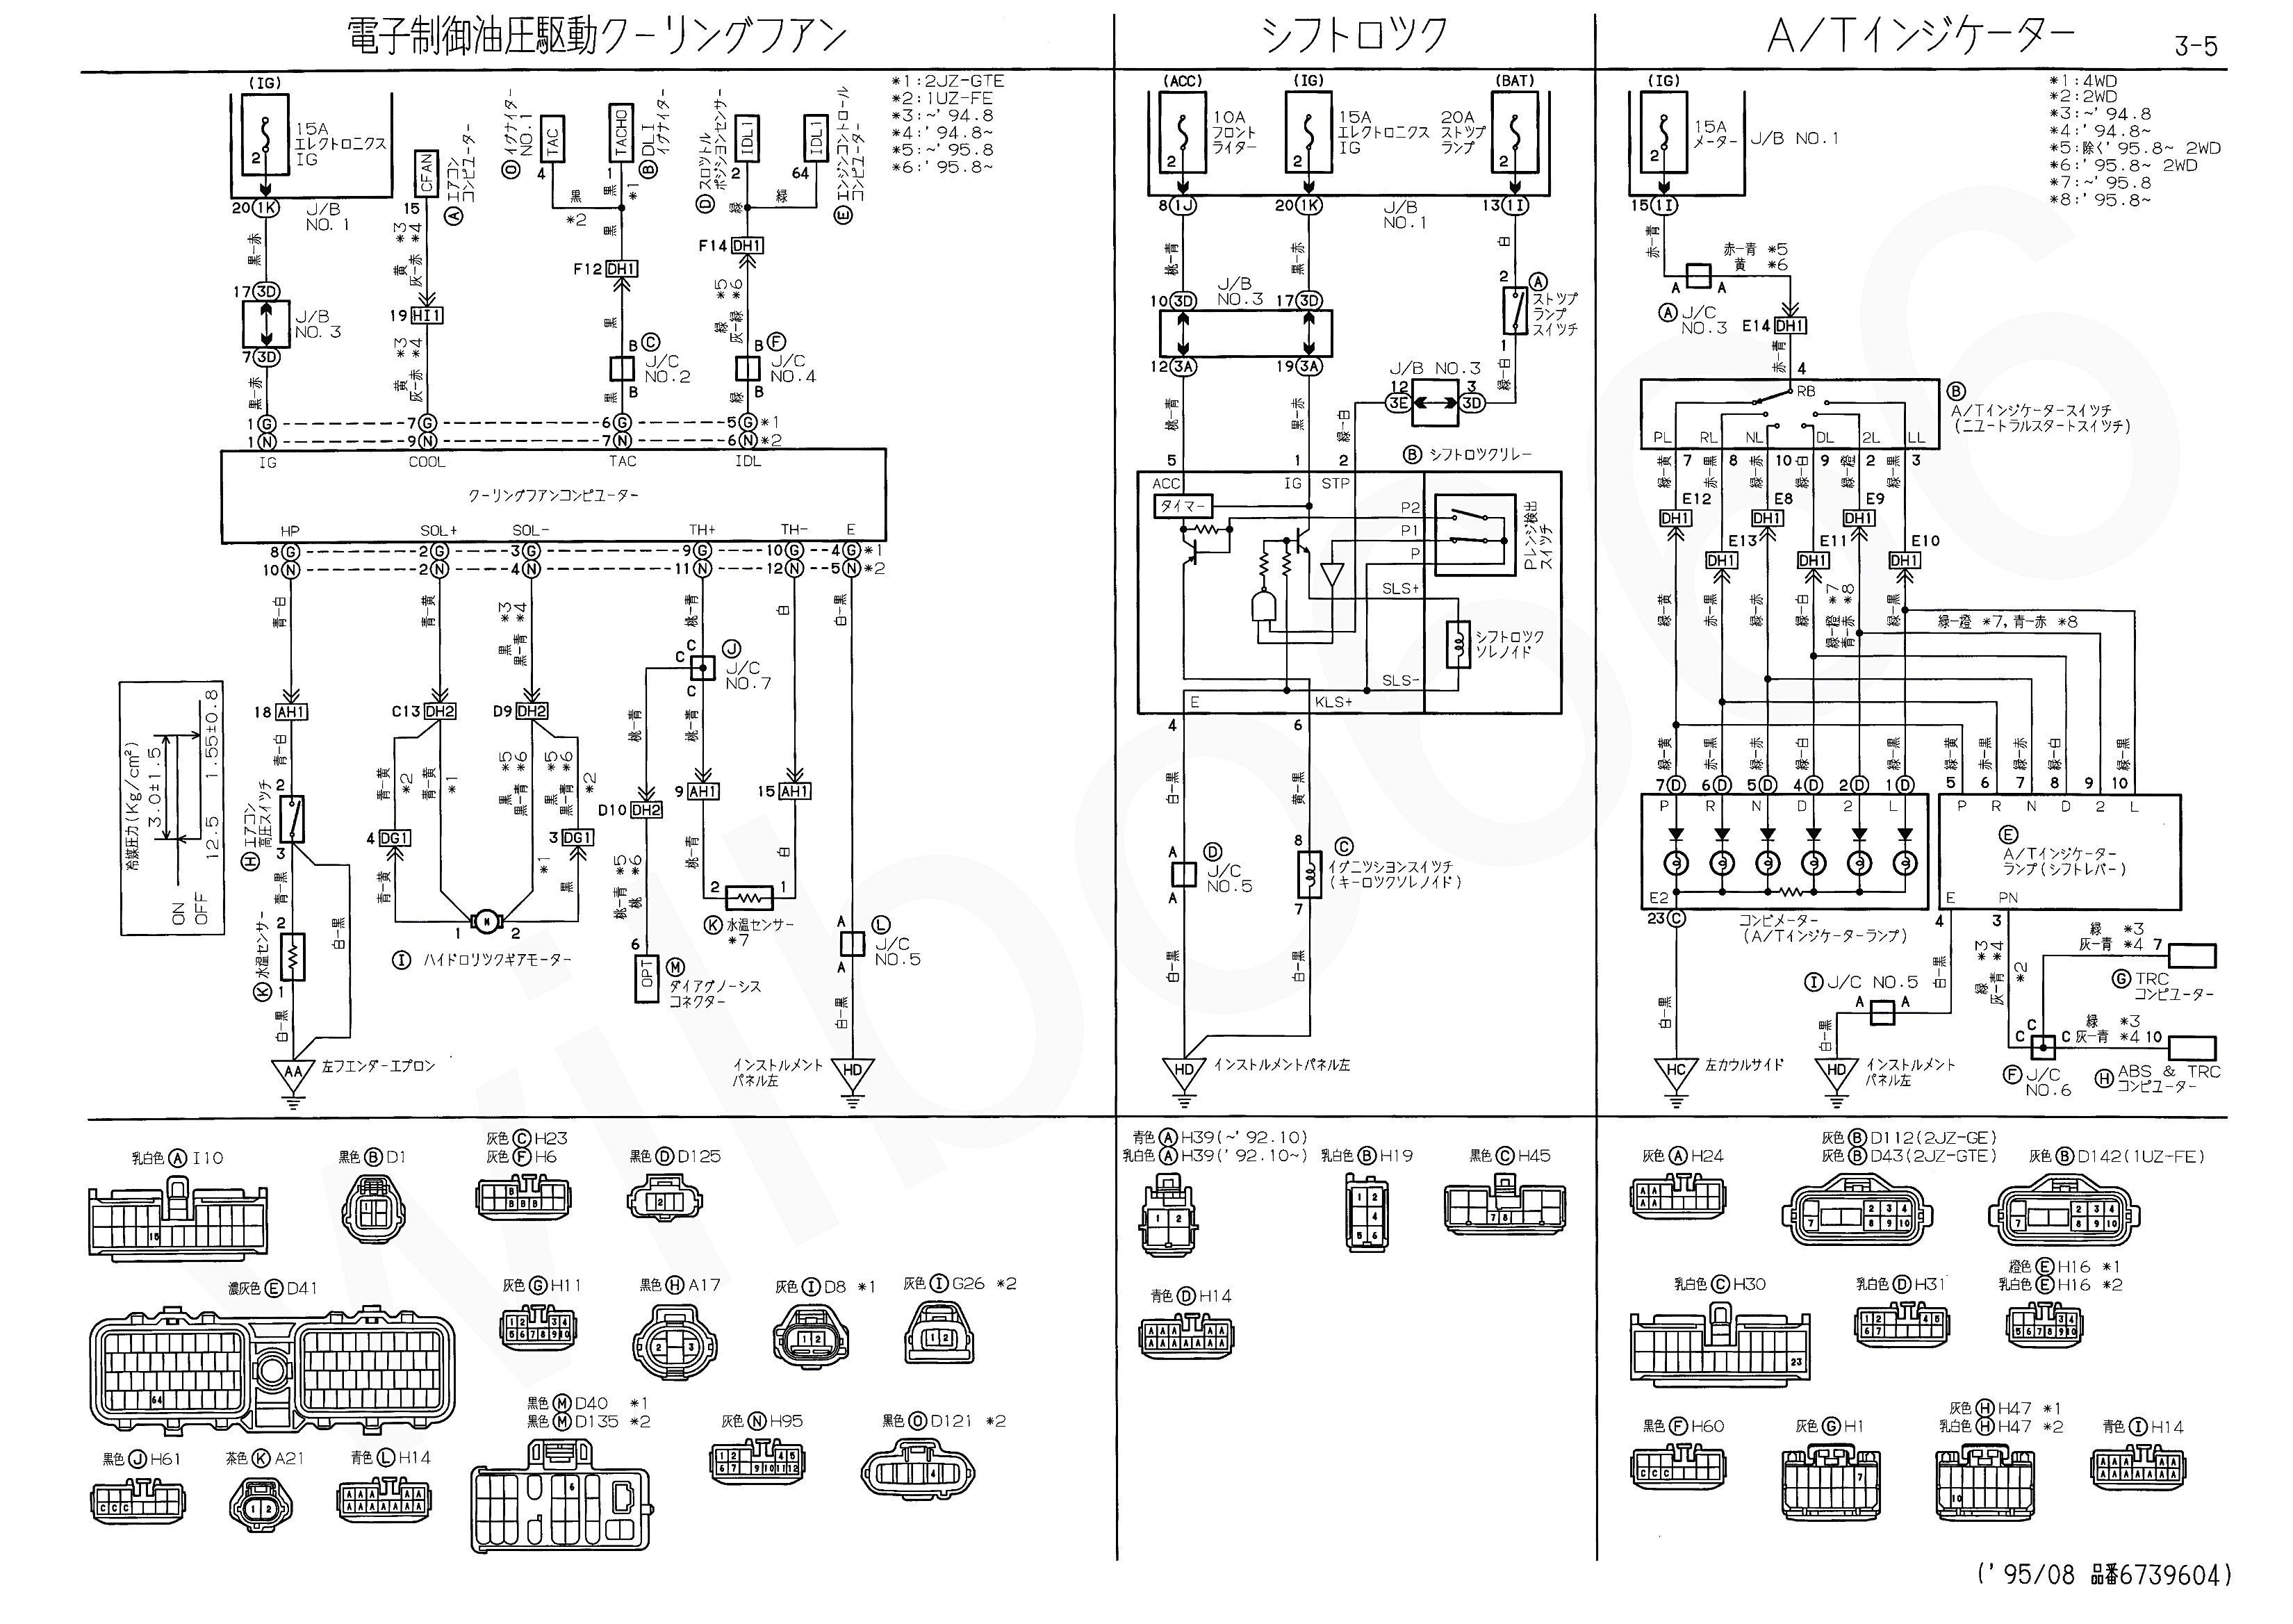 Ge Dryer Wiring Diagram | Wiring Diagram on